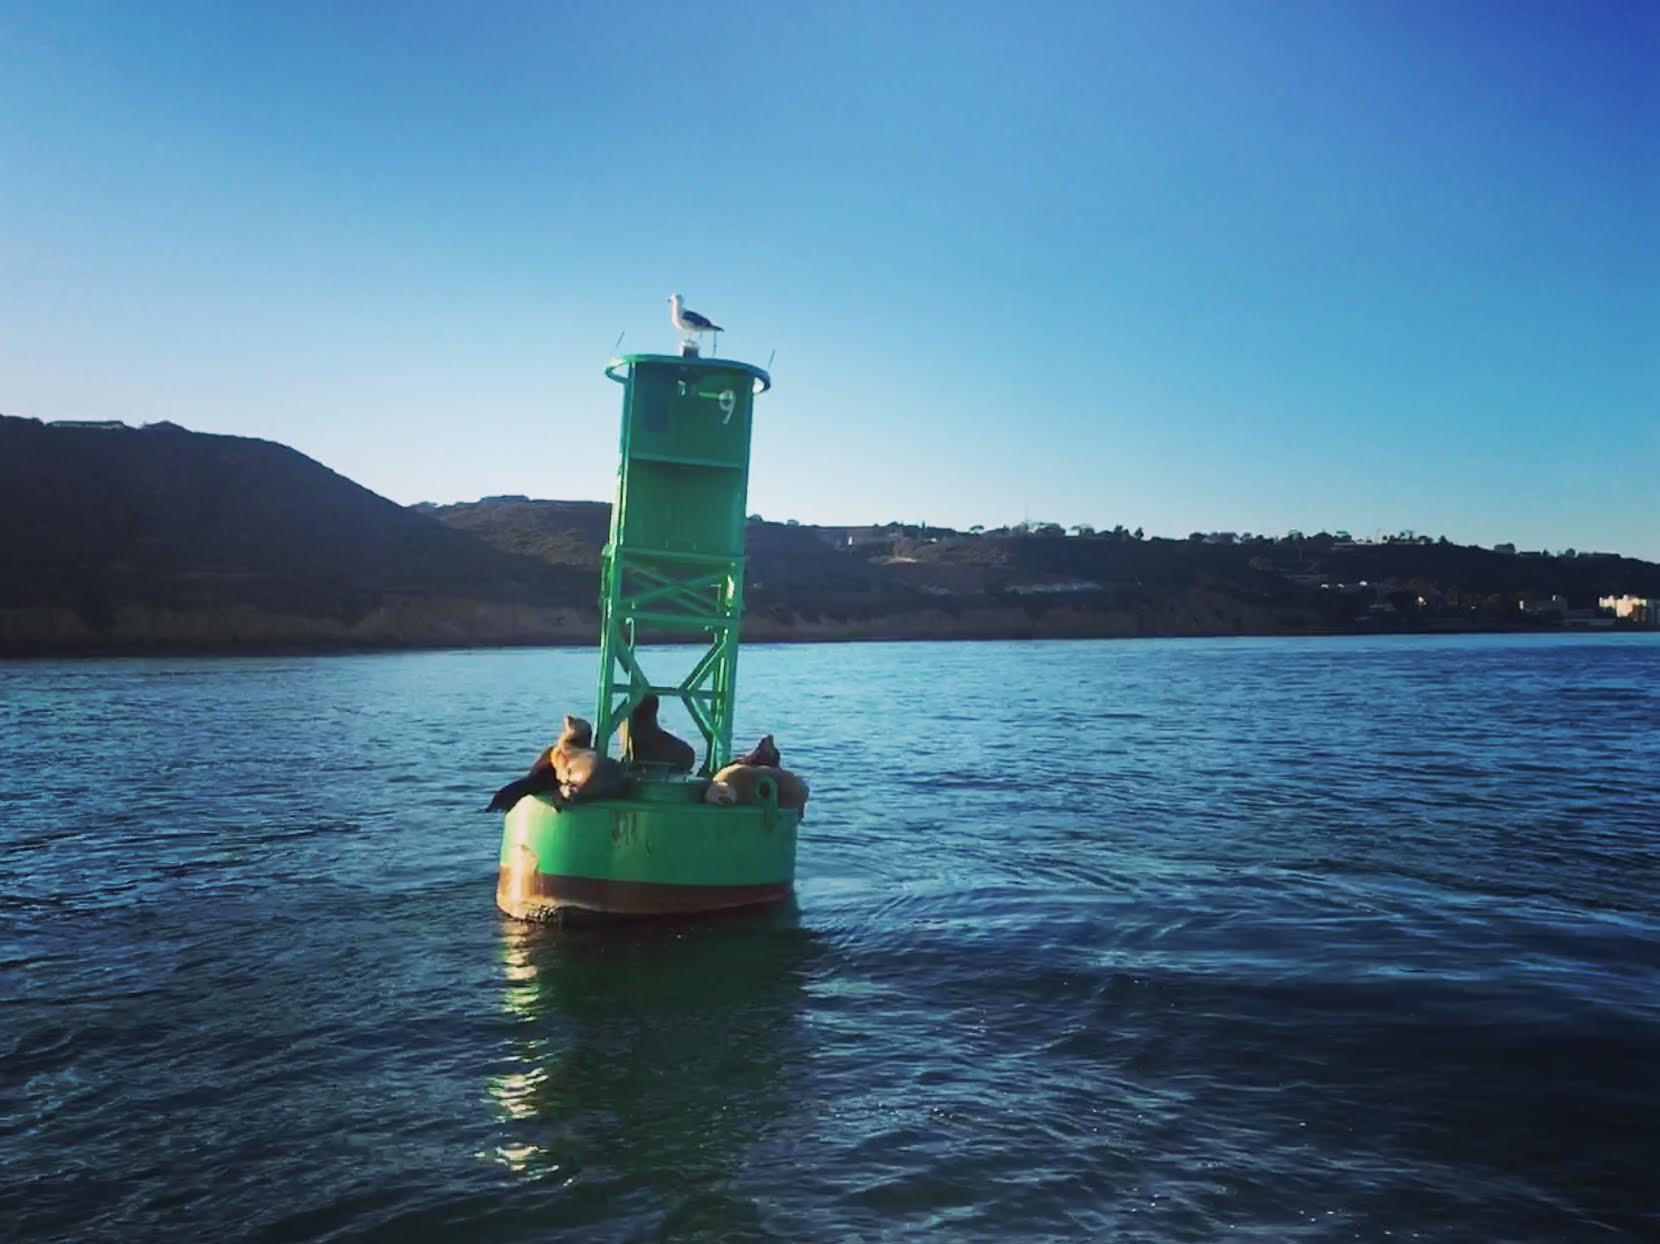 point-loma-seagull-seals-san-diego-bay-buoy.jpg